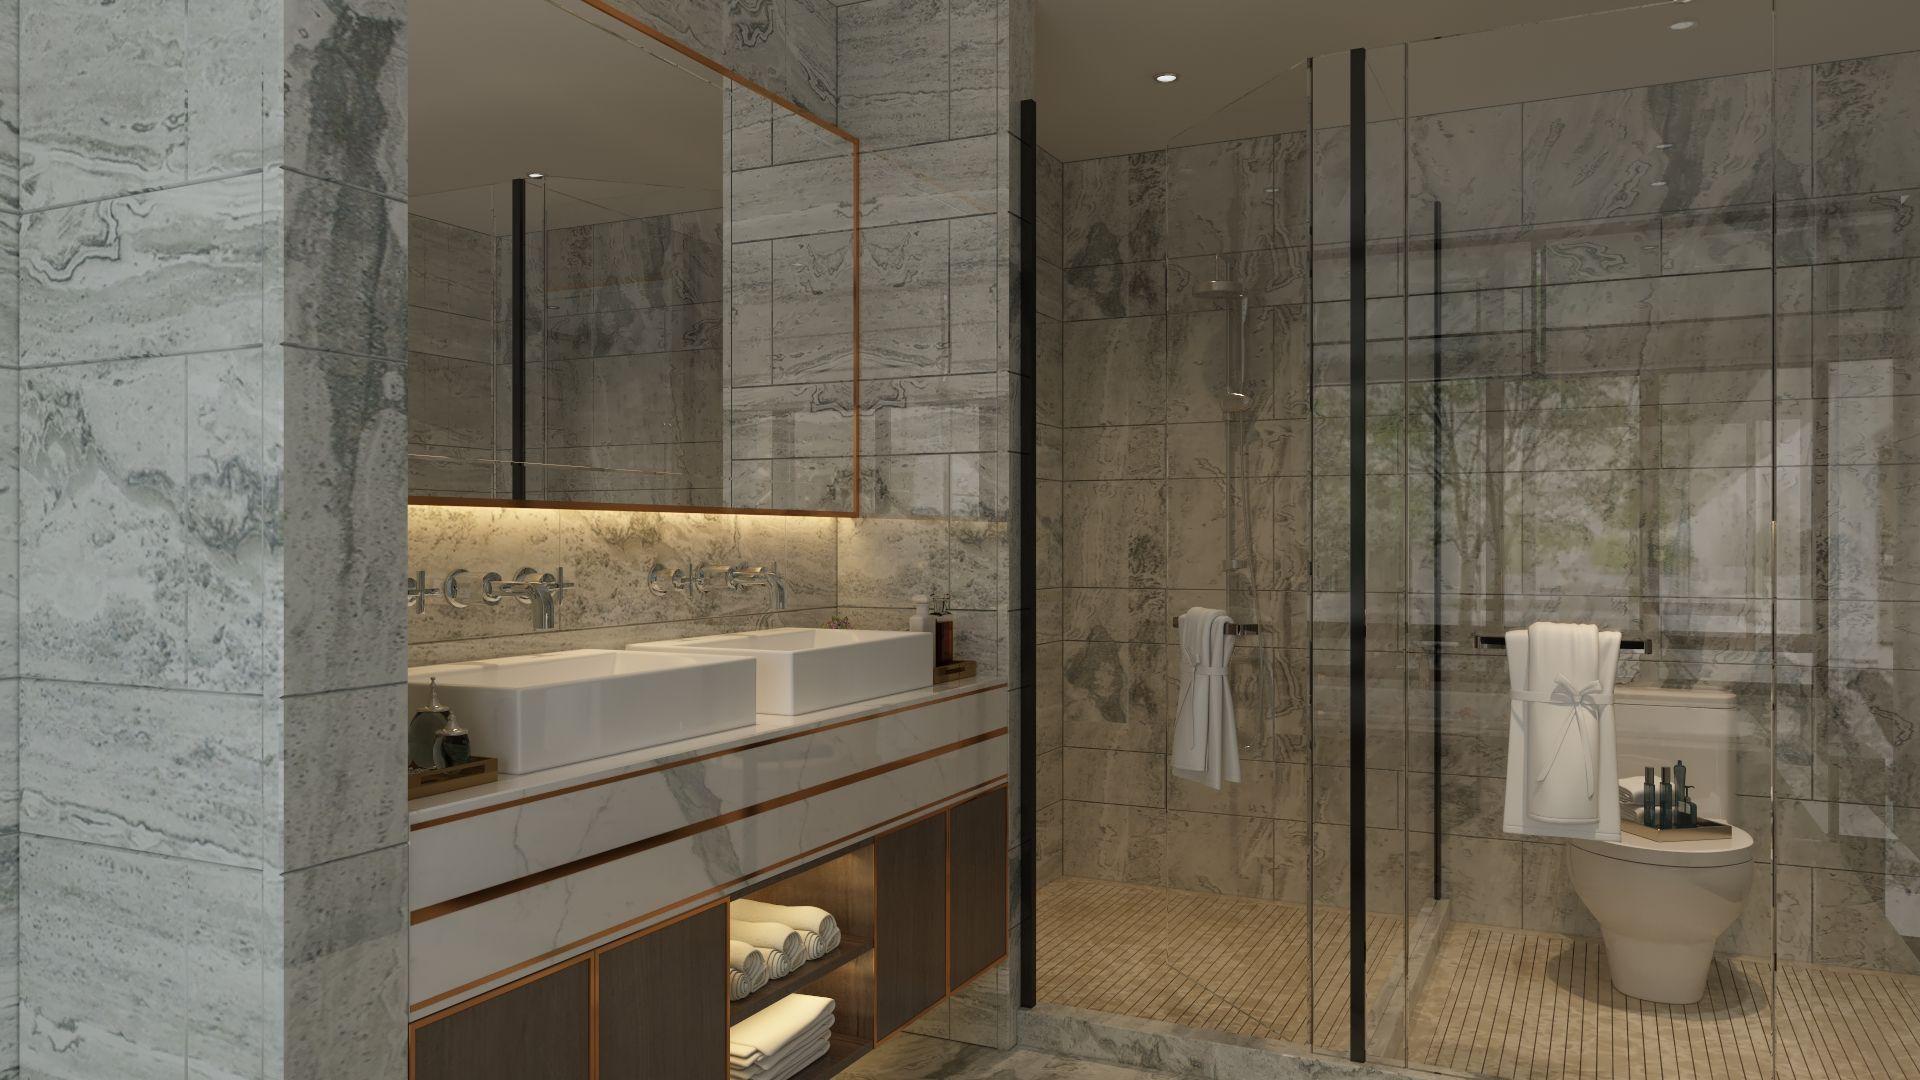 مغاسل ستتواريو Marble Bathtub Bathroom